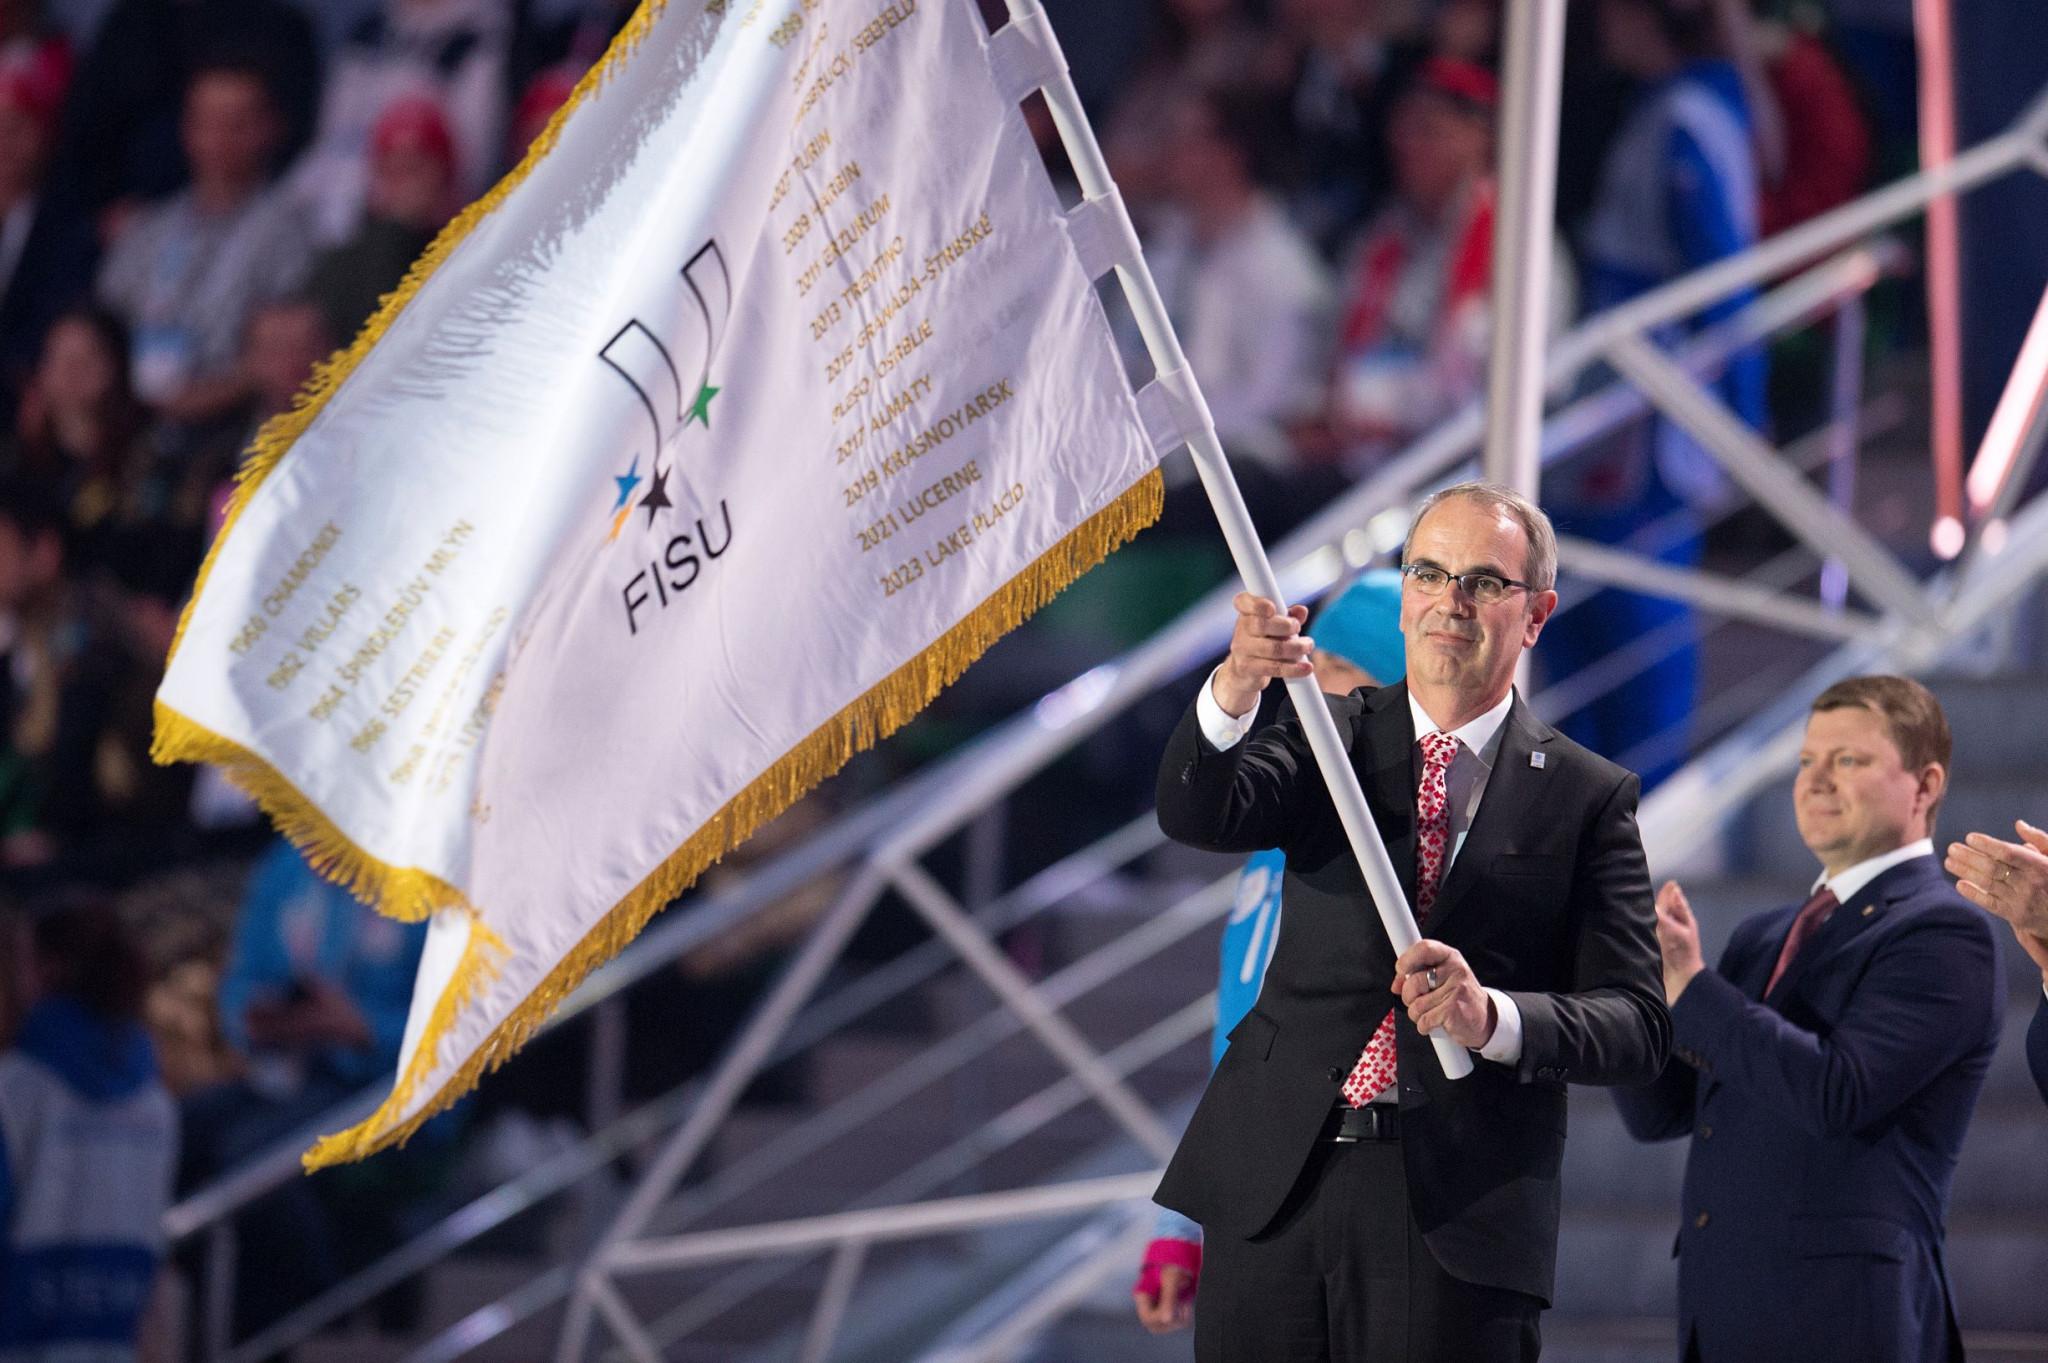 FISU say it was not an easy decision to postpone the Lucerne 2021 Winter Universiade ©FISU